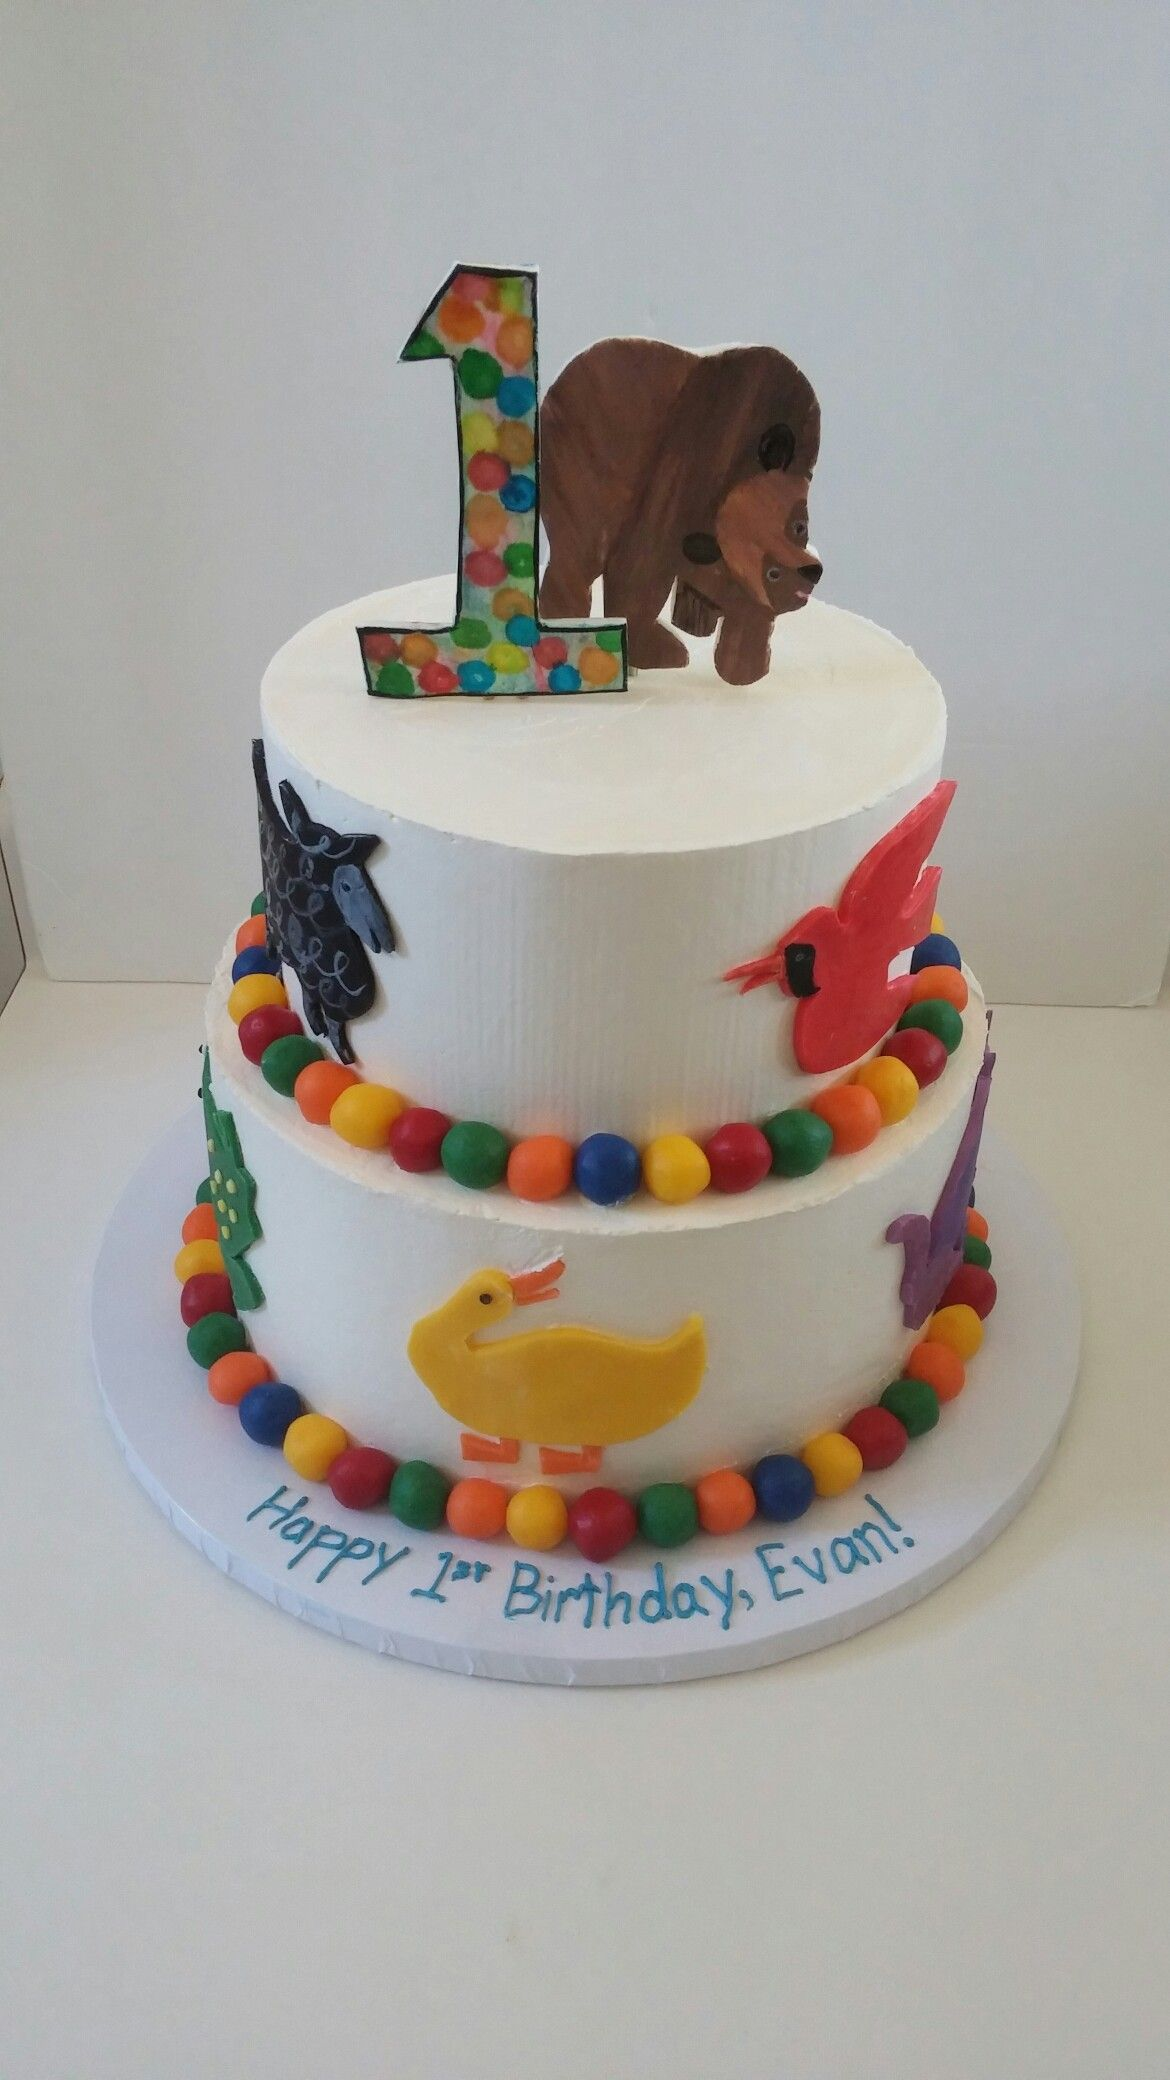 Brown Bear St Birthday Cake Sweets Gourmet Bakery Pinterest - Bear birthday cake